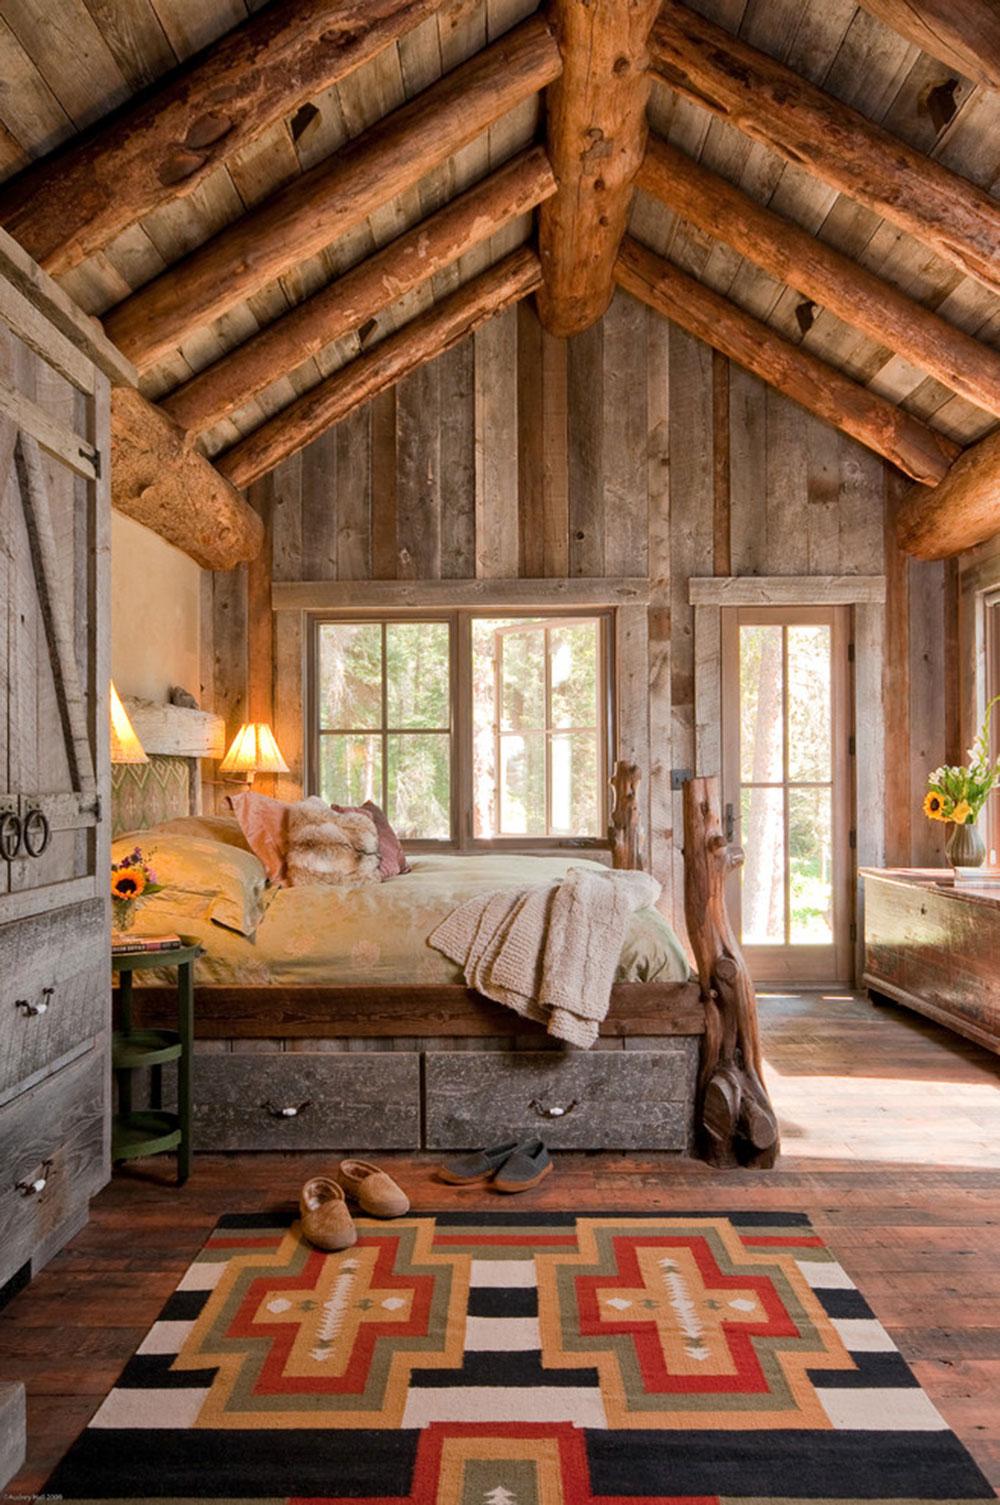 Rustik-sovrum-design-idéer-som-utstrålar-komfort-2 Rustik-sovrum-design-idéer-som-utstrålar komfort